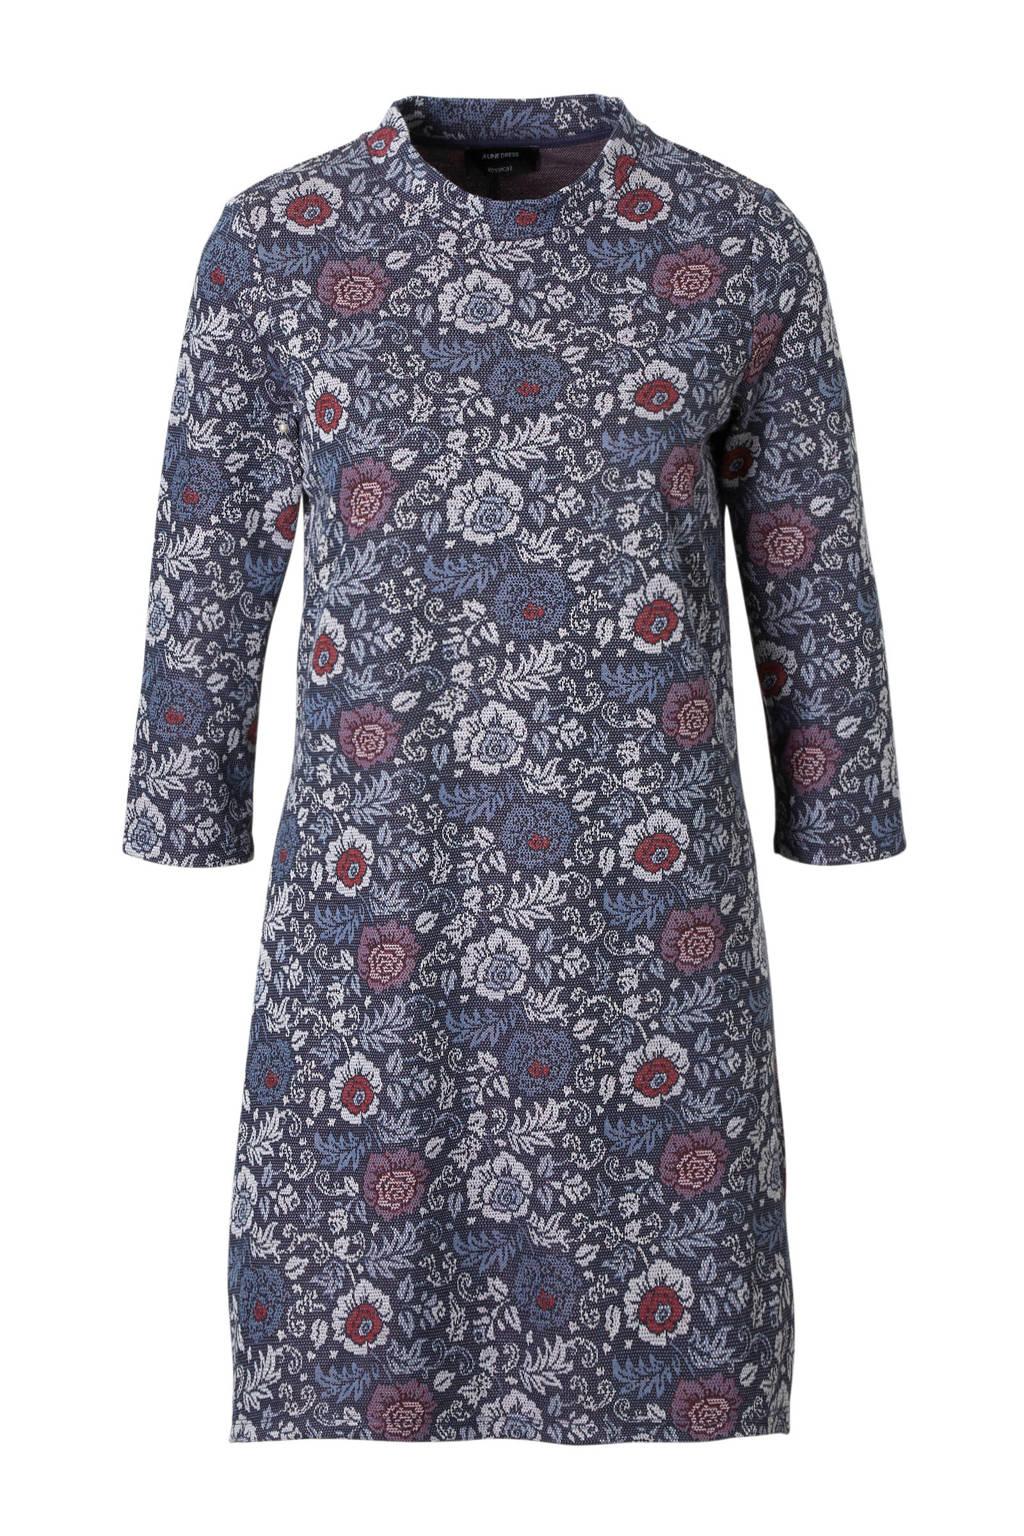 C&A Yessica gebloemde A-lijn jurk, Donkerblauw